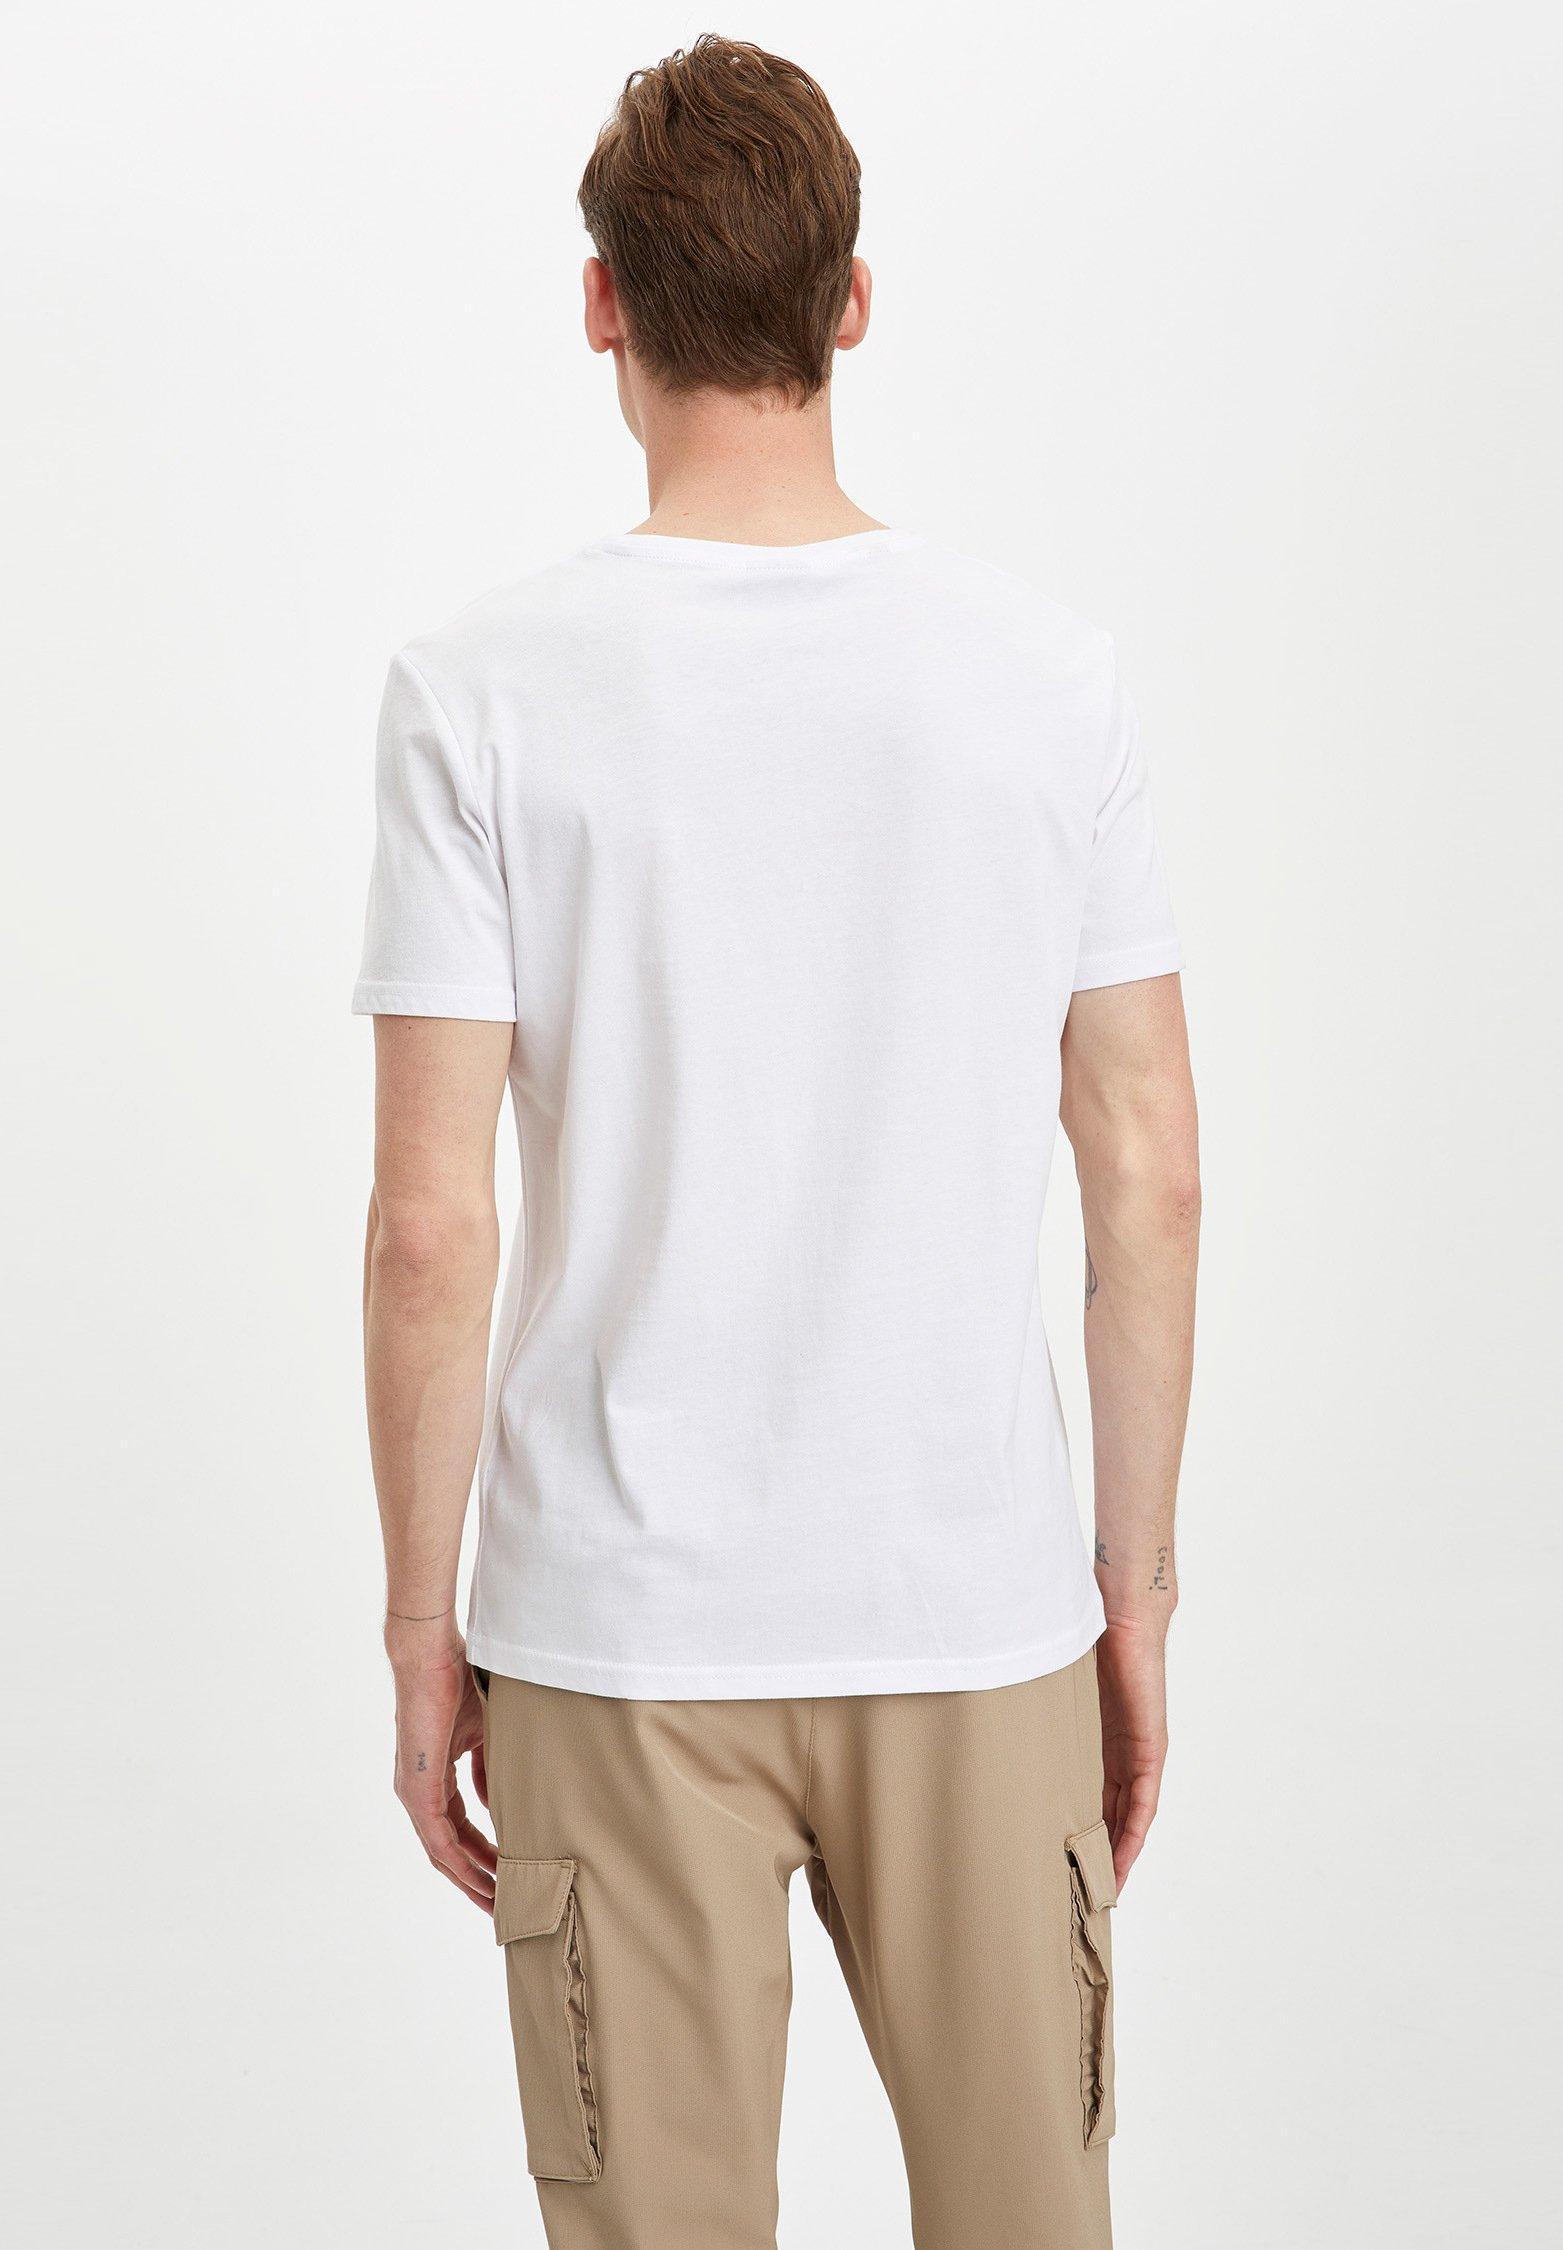 DeFacto Print T-shirt - white J3c2B